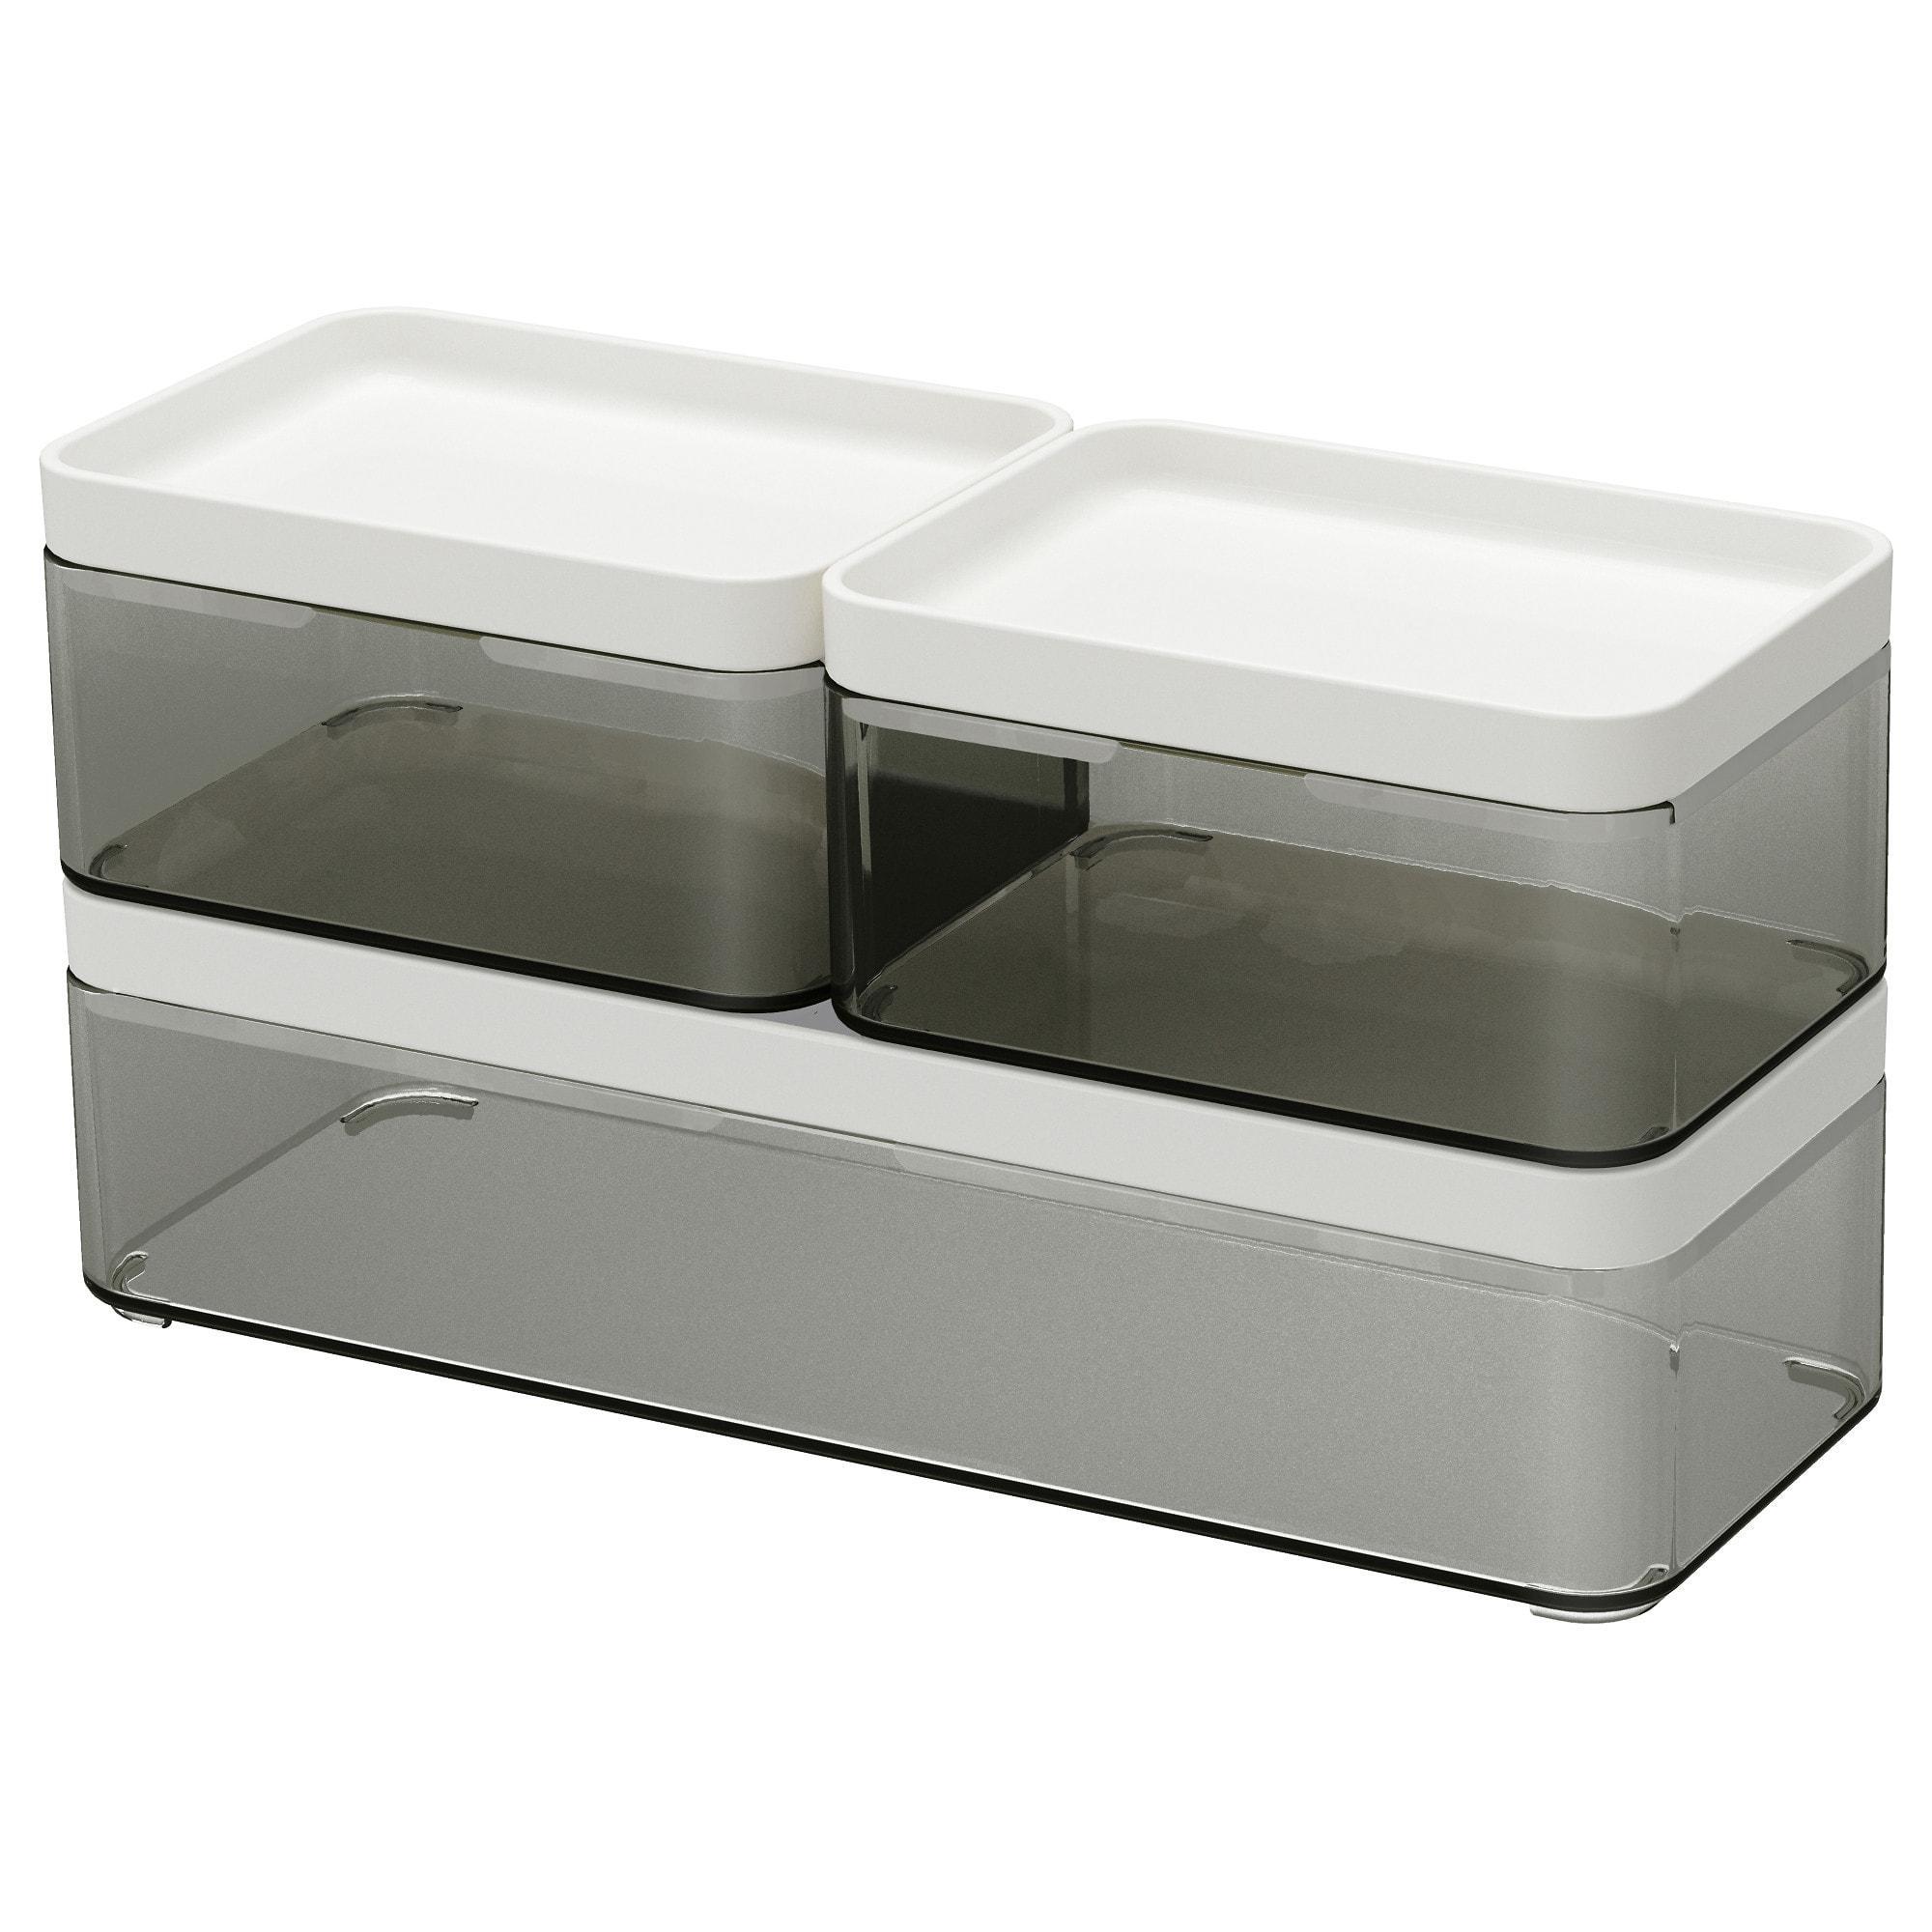 PROMO!! IKEA BROGRUND Kotak, set isi 3, abu-abu transparan, putih MURAH /  BUBBLE 3 LAPIS / ORIGINAL / IKEA ORIGINAL